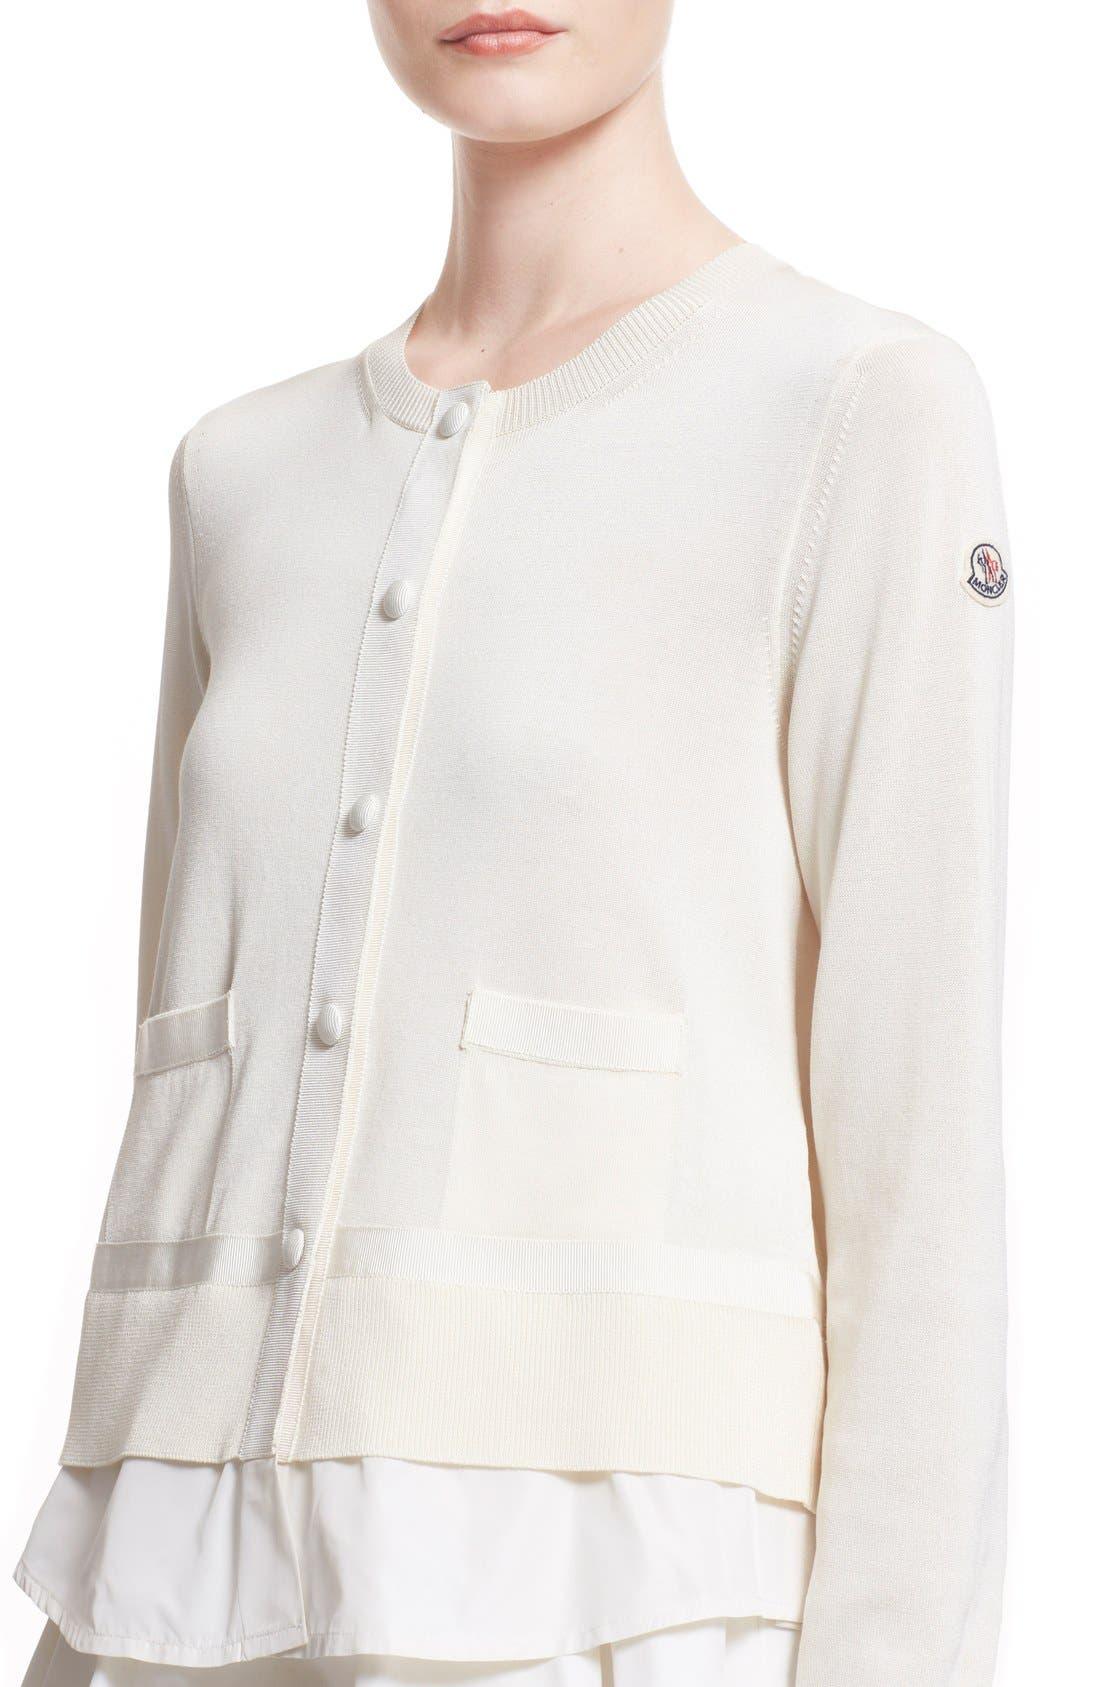 'Maglia' Tricot Button Cardigan,                             Alternate thumbnail 4, color,                             WHITE